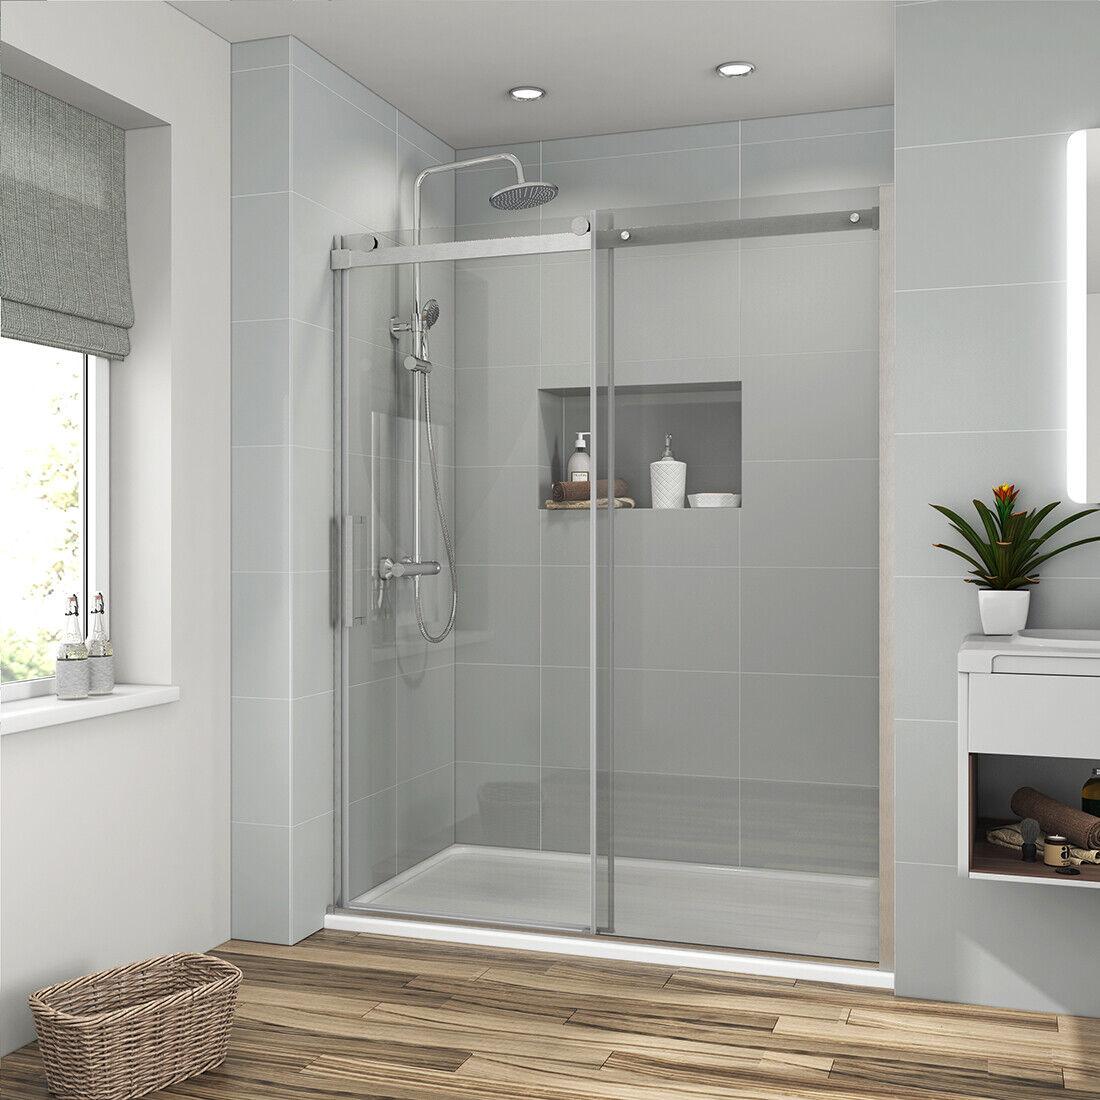 48 X 72 Frameless Sliding Shower Doors Screen 5 16 Clear Glass Brushed Nickel